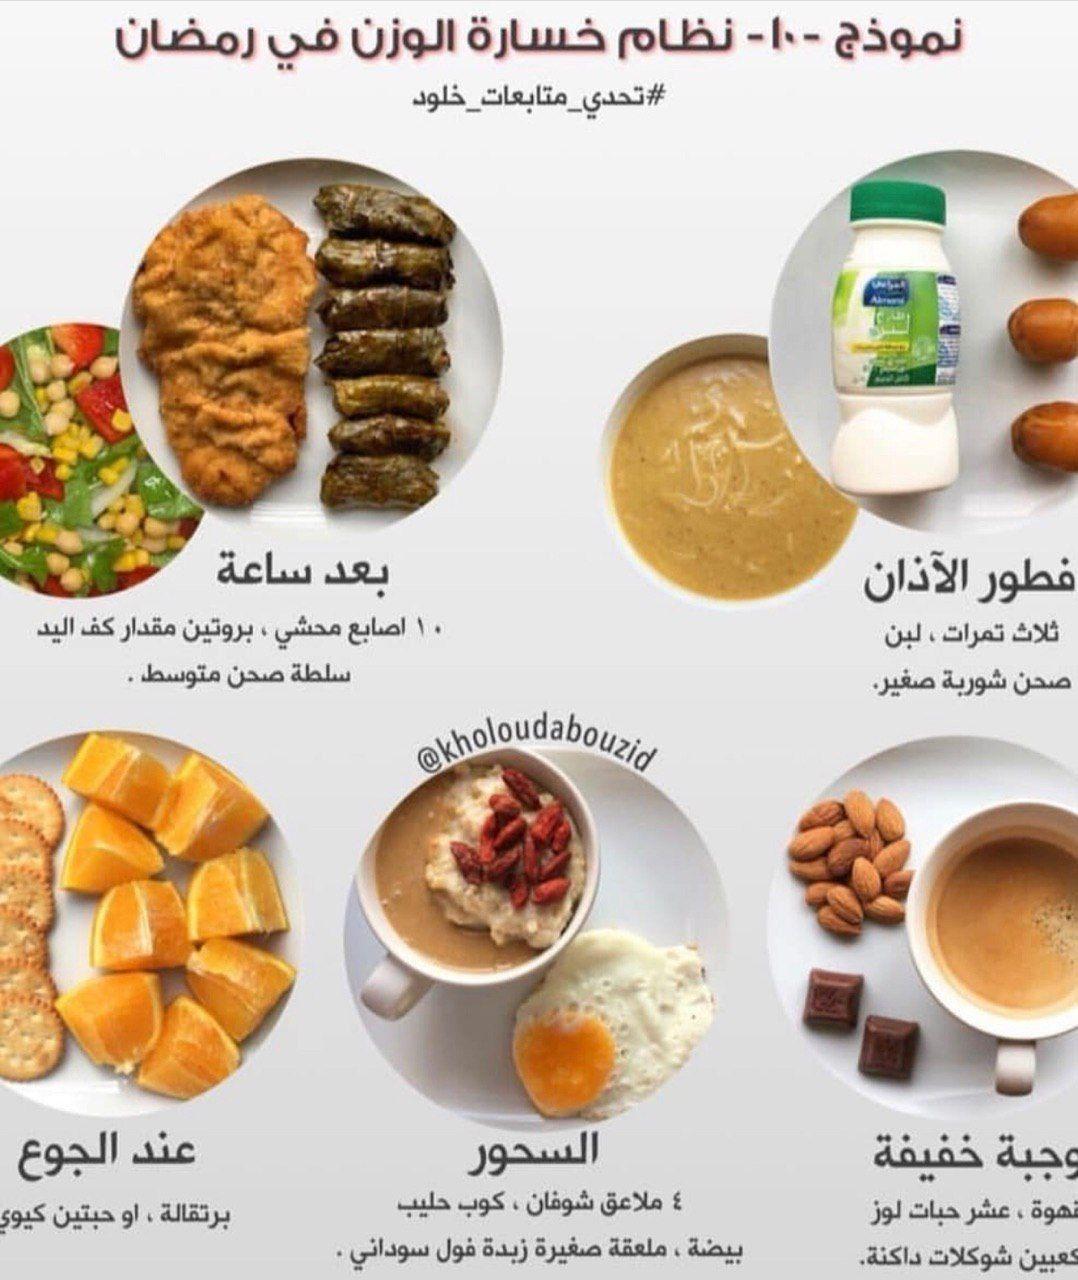 Pin By Fariba Mayahi On دواء Health Facts Food Health Fitness Food Helthy Food